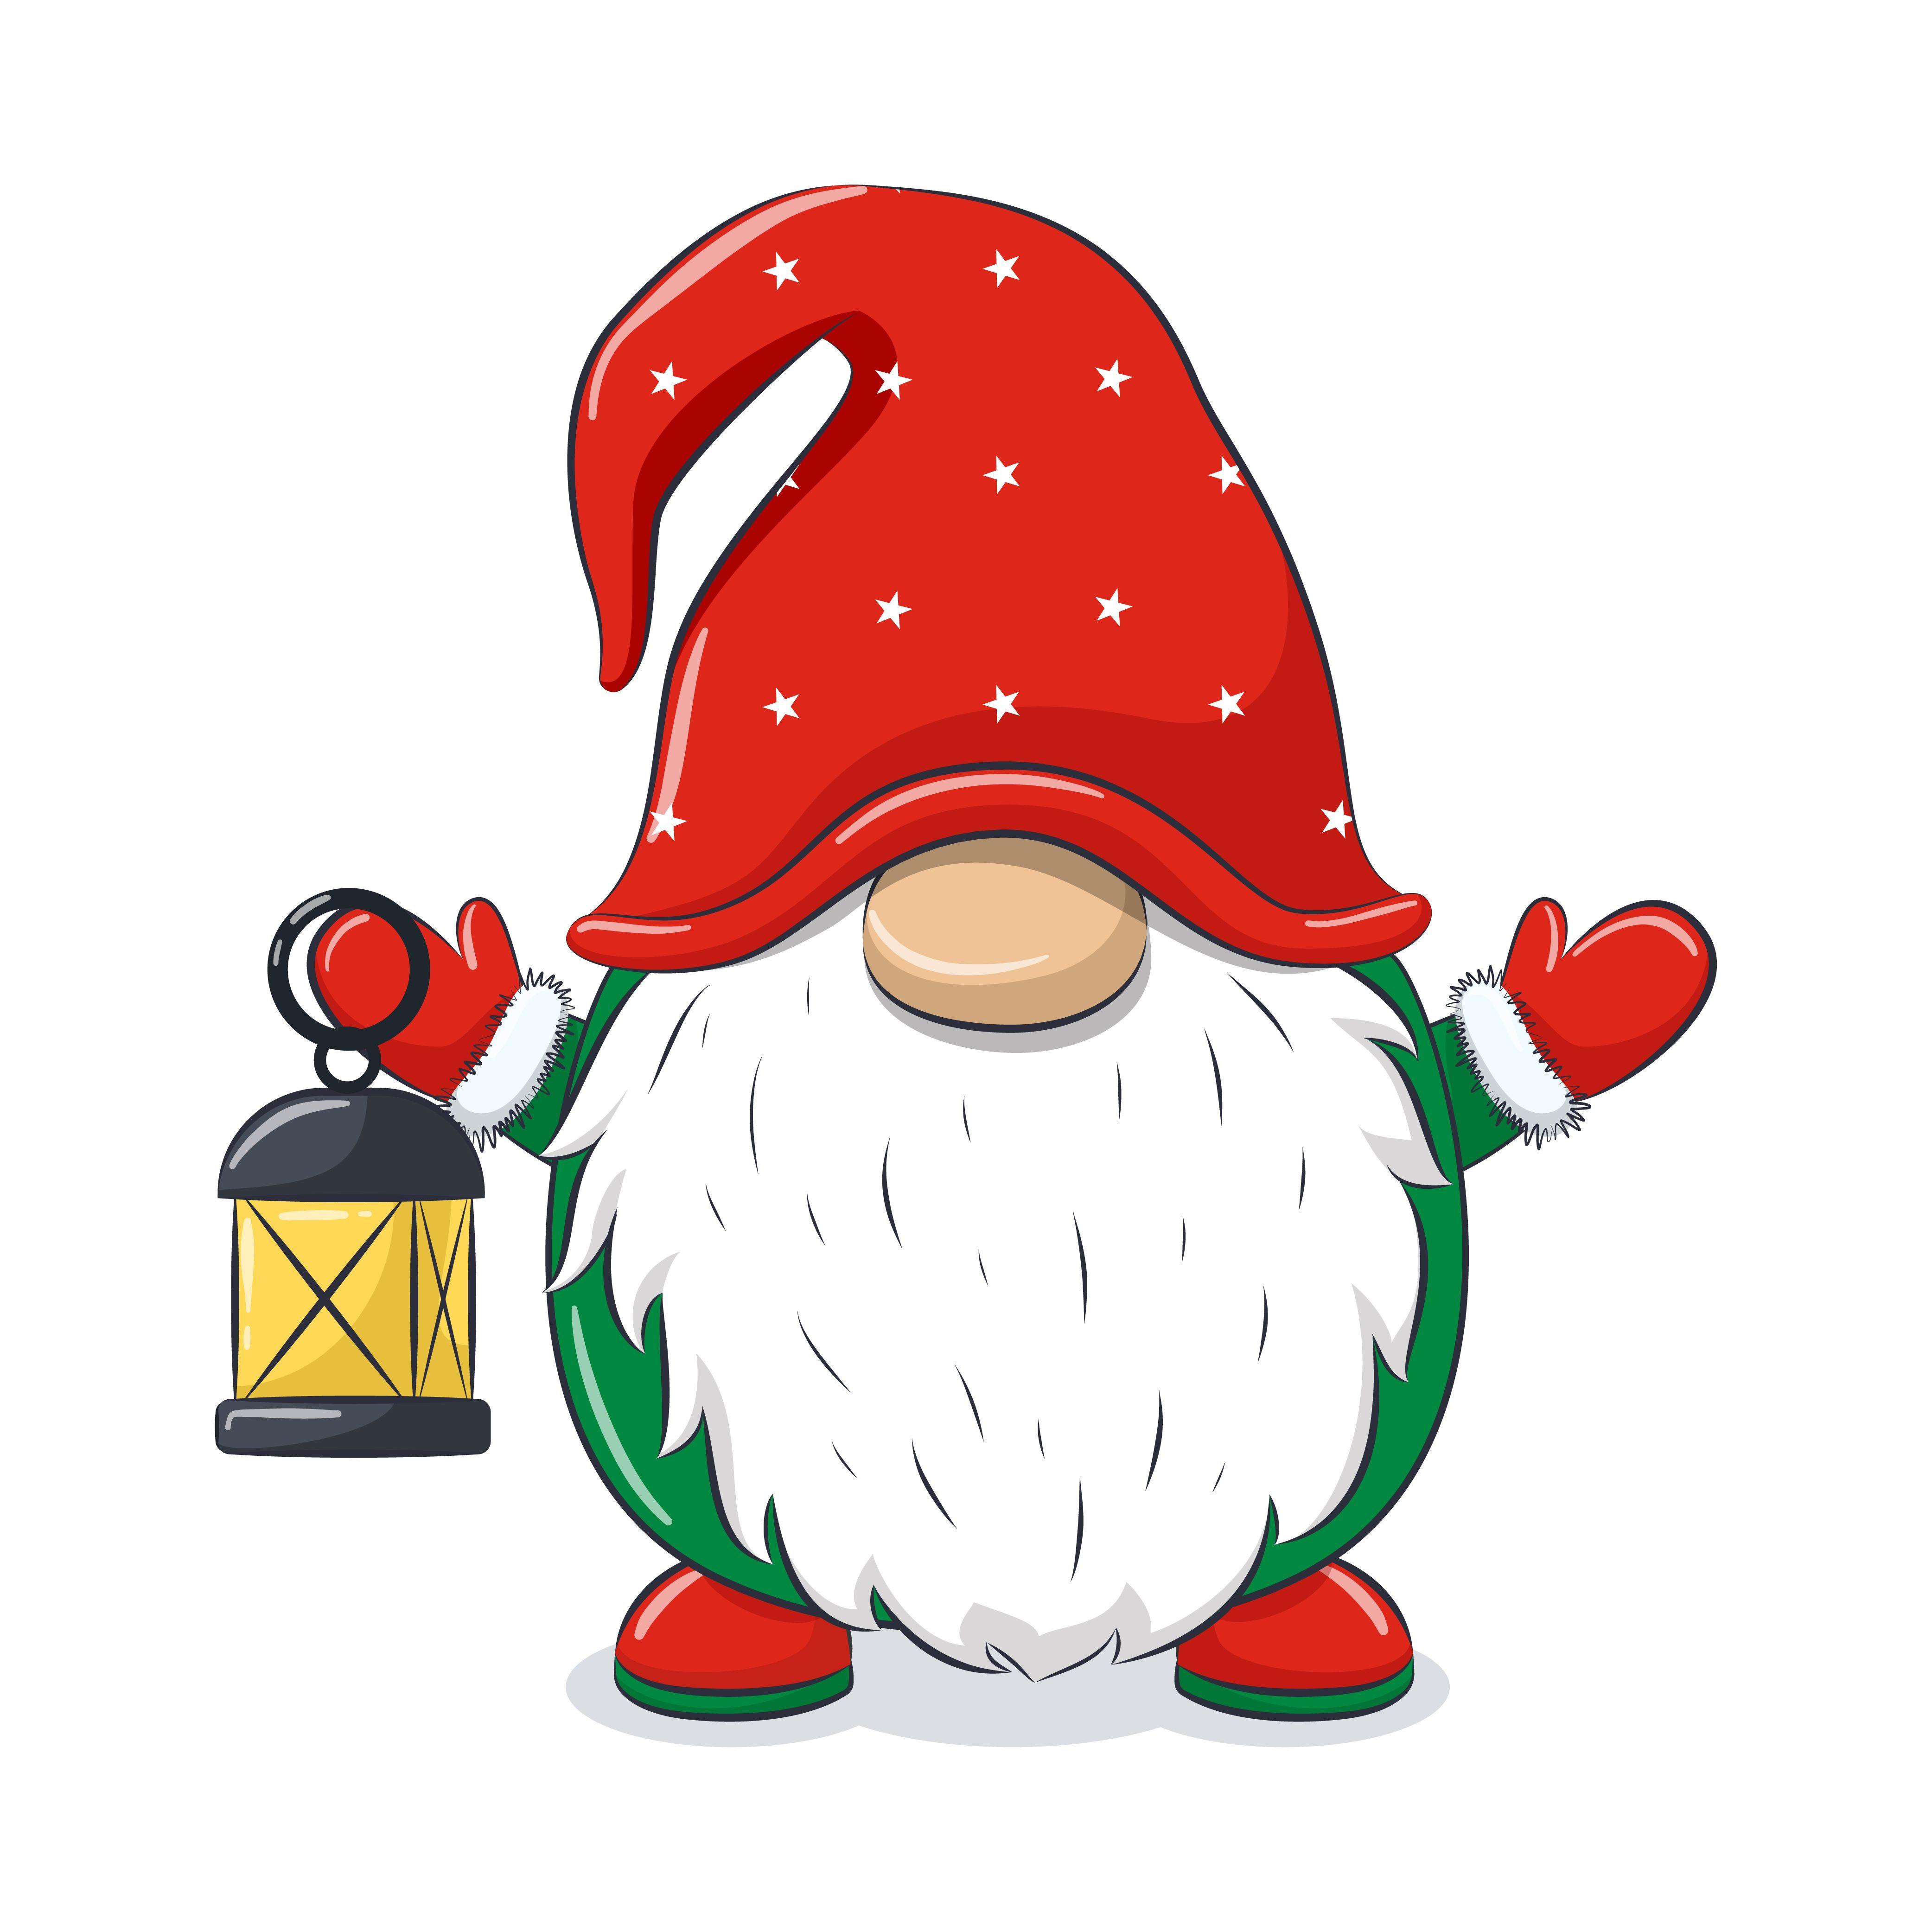 Christmas Gnome Clipart Eps Png Jpeg Nordic Gnome New Year Etsy In 2021 Christmas Gnome Christmas Drawing Christmas Paintings